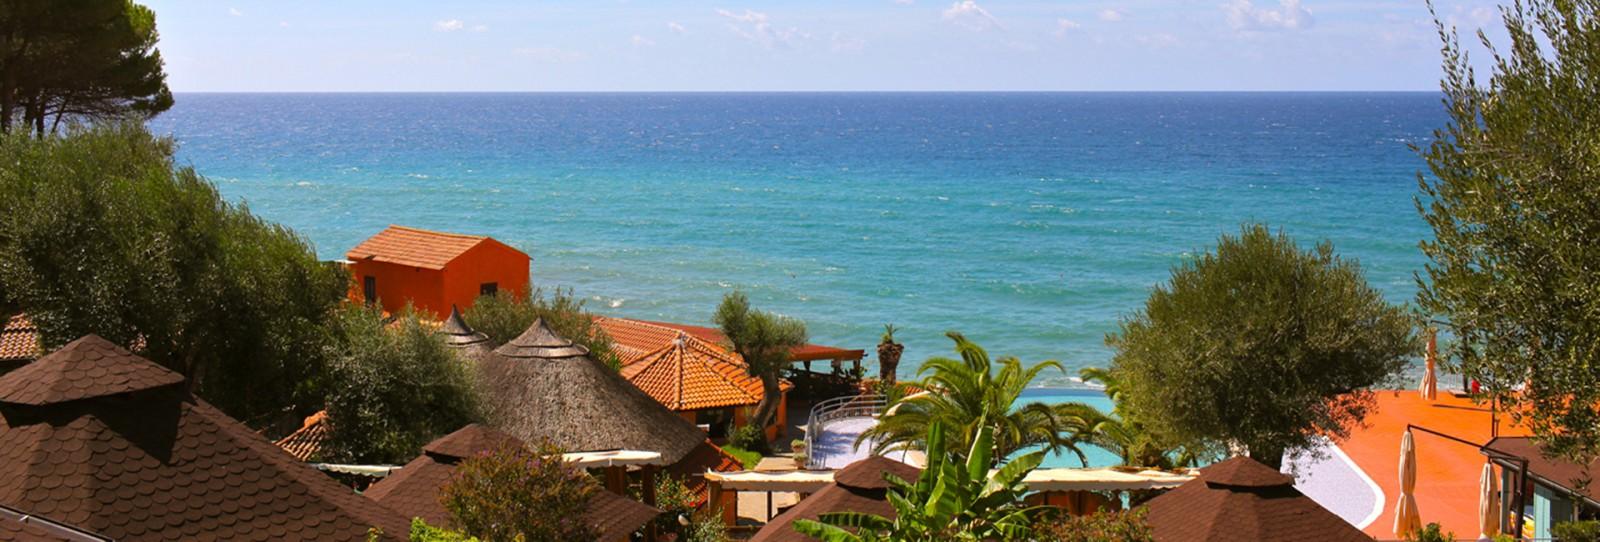 Resort Baia del Silenzio Palinuro